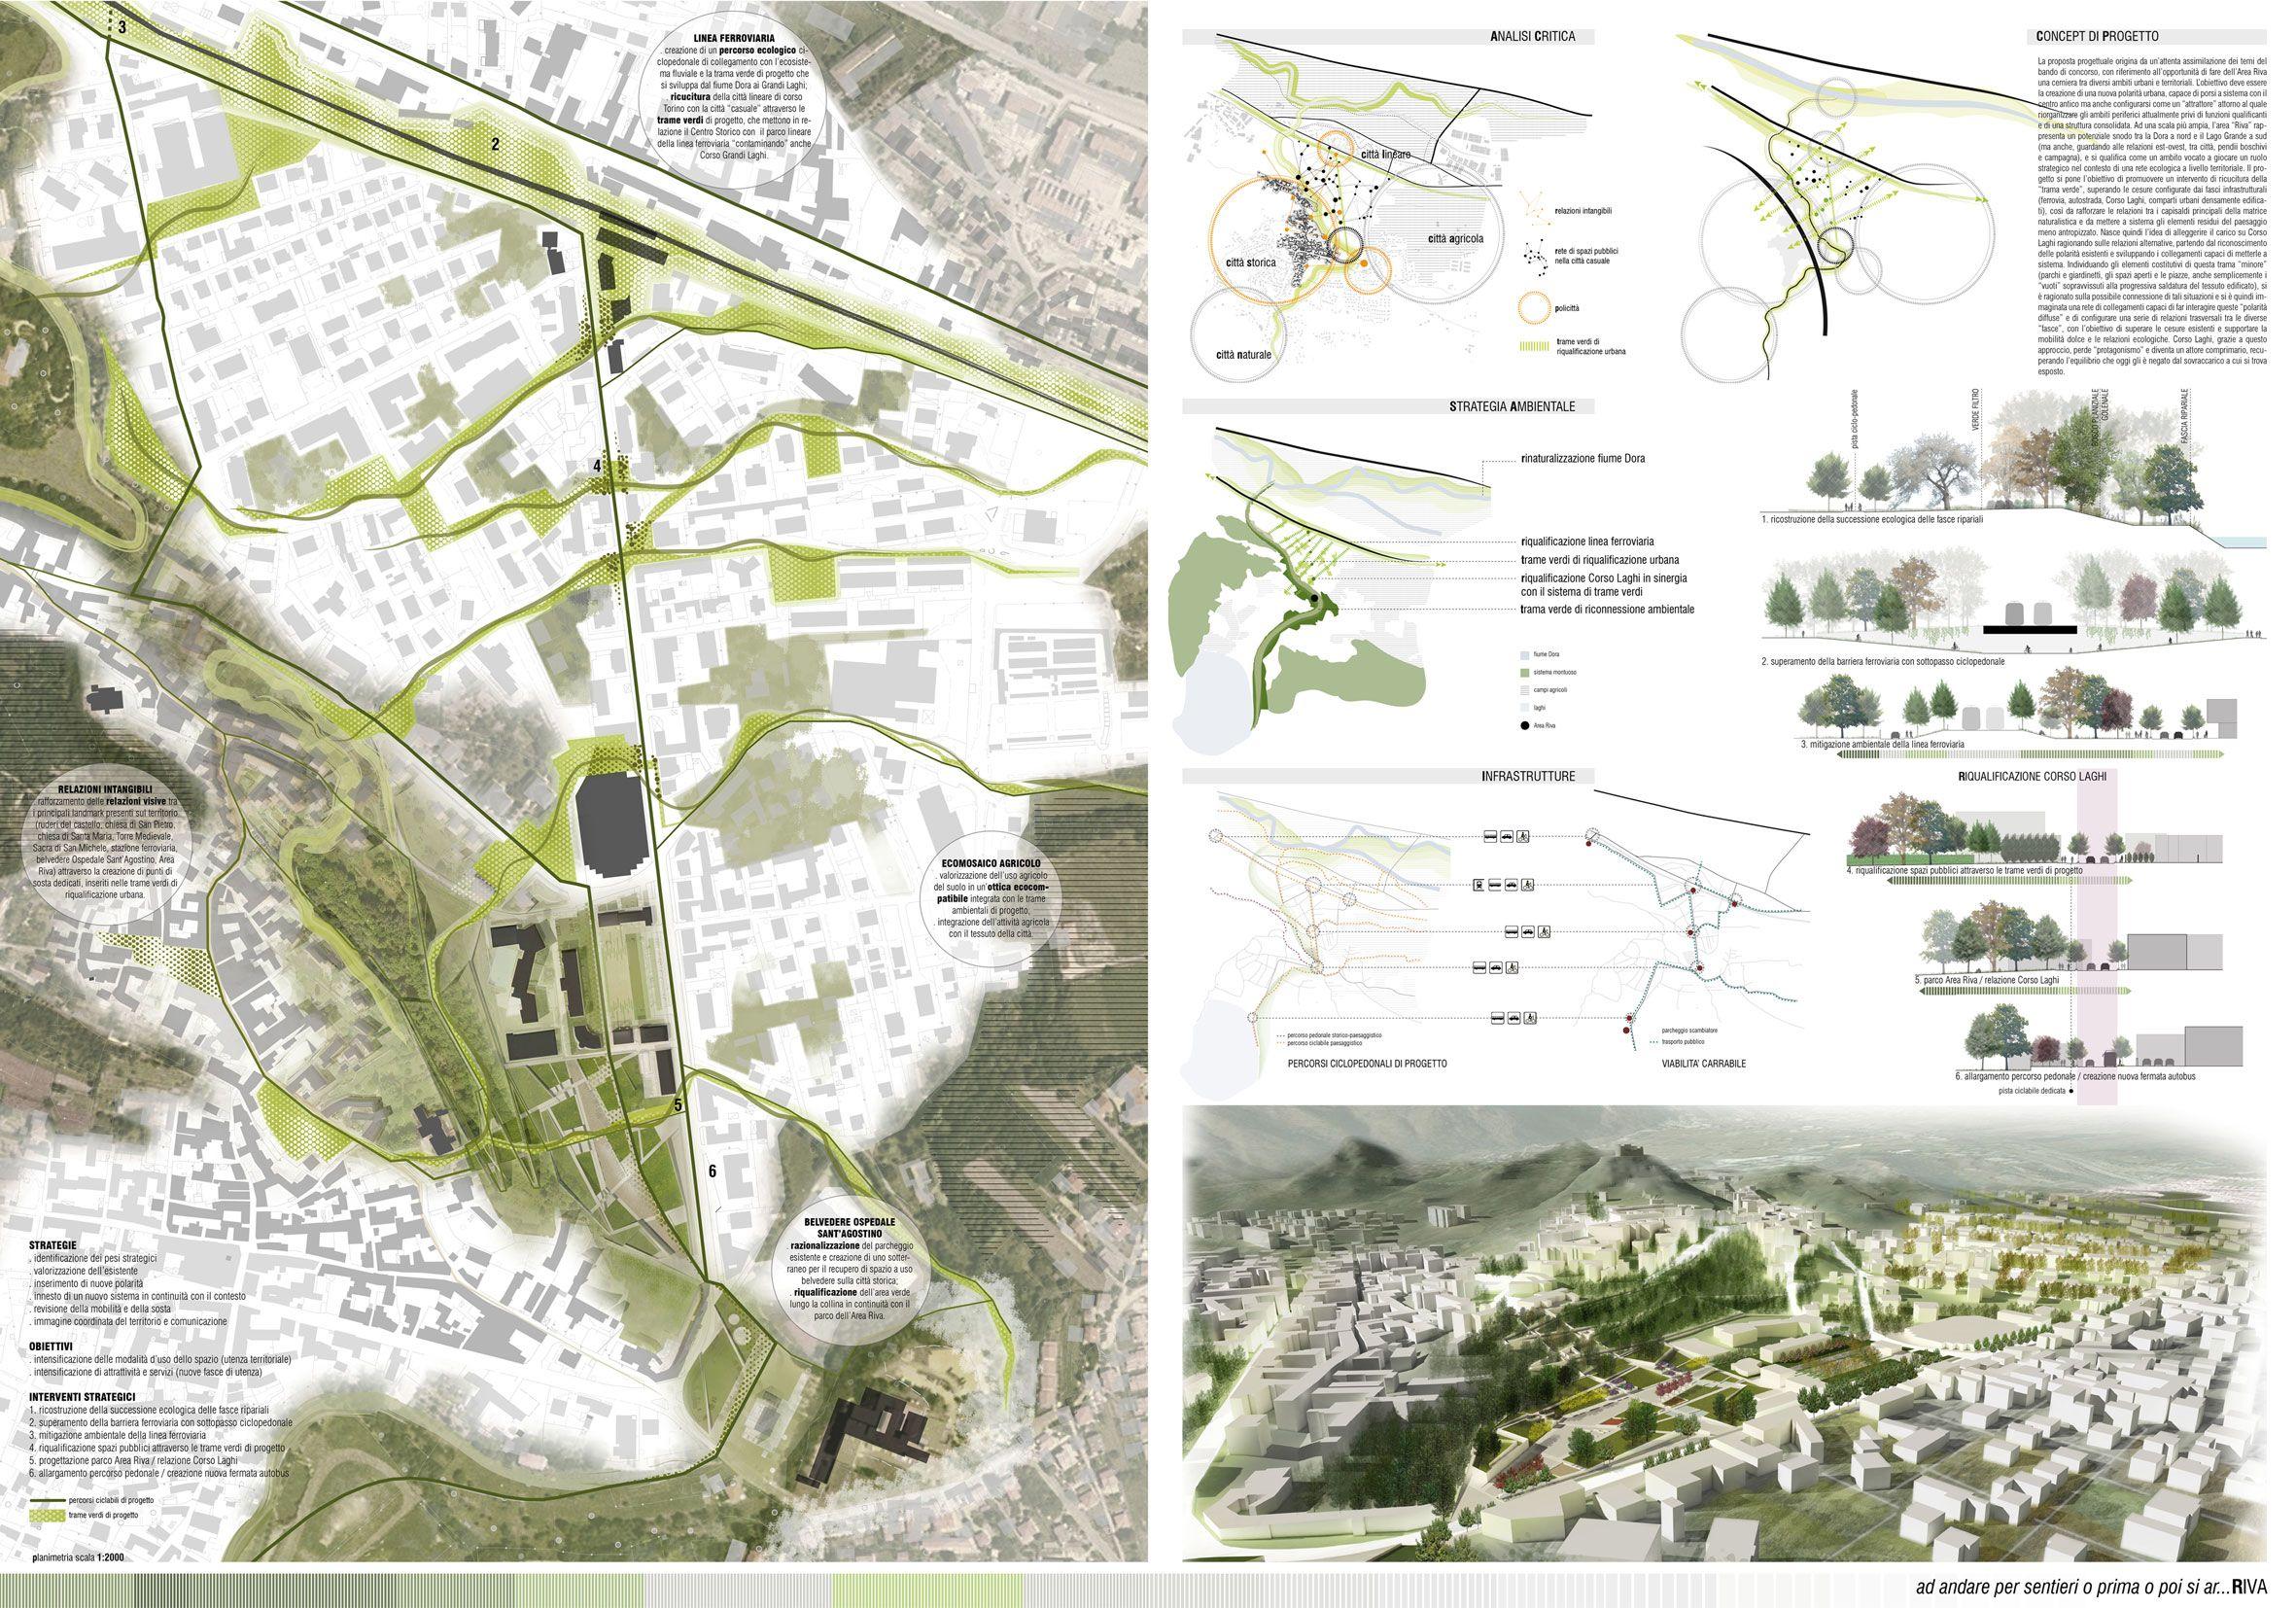 Parco urbano e centro citt avigliana maria vittoria for Master architettura